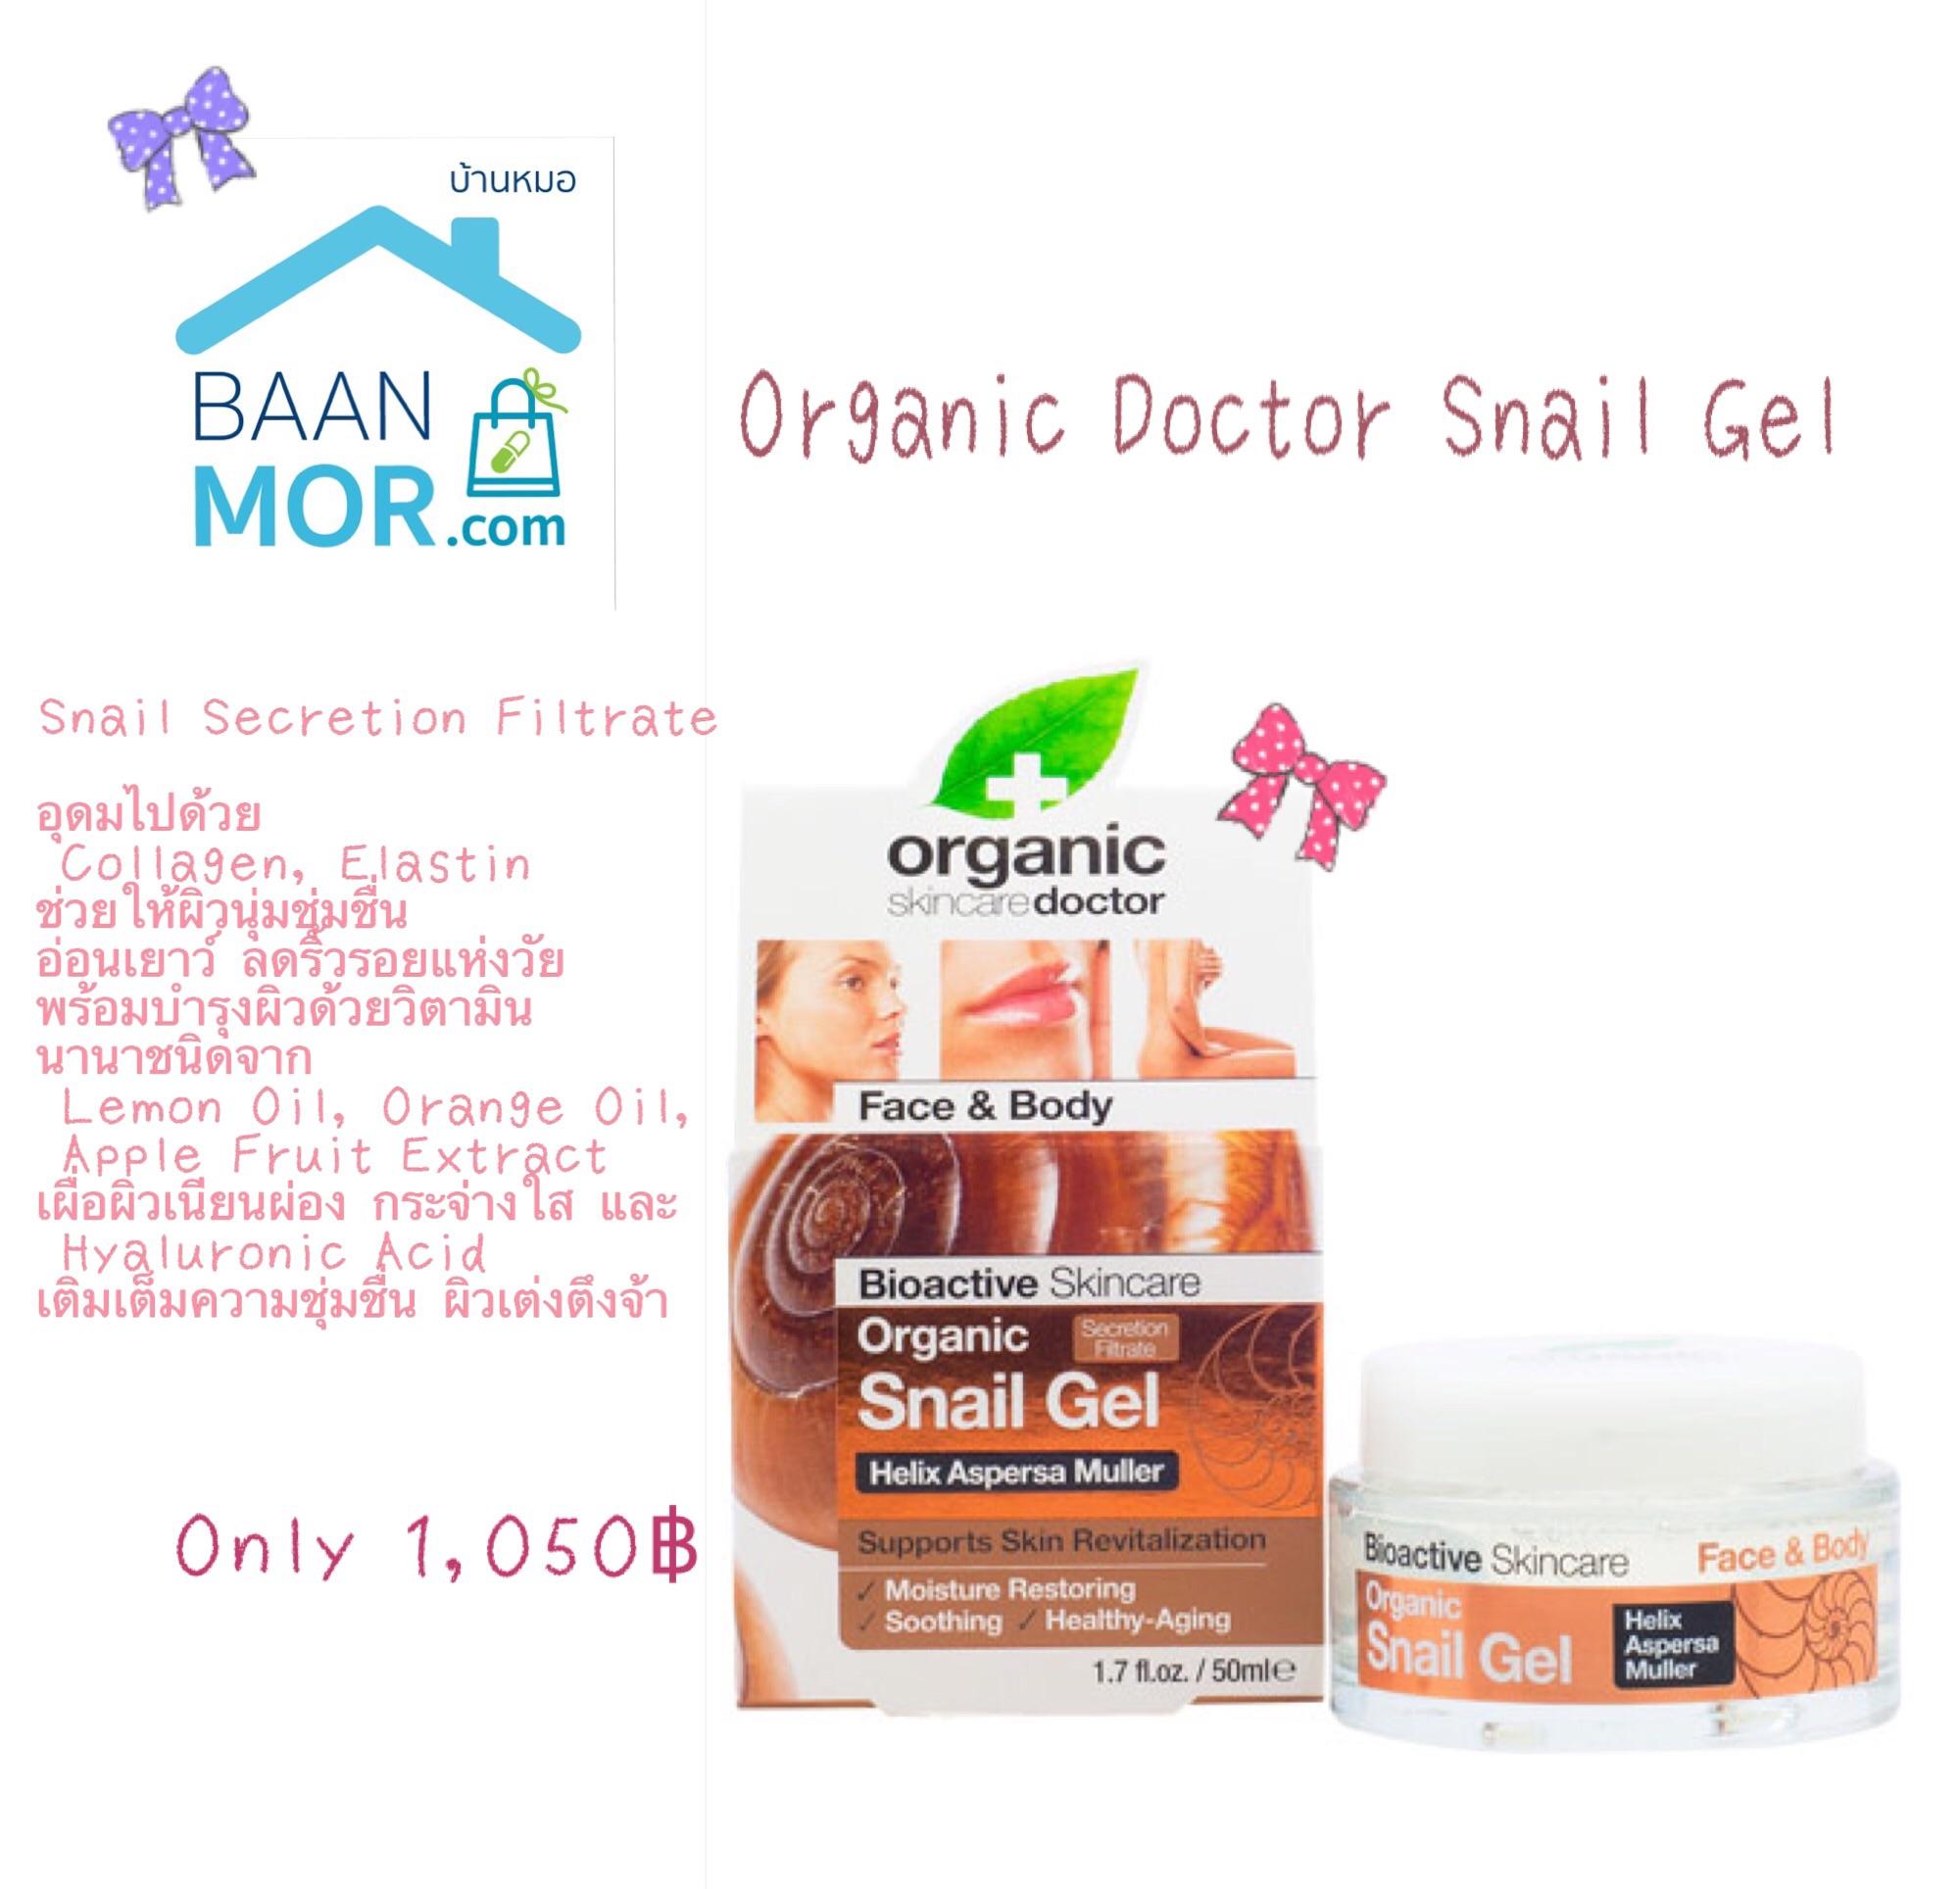 Organic Doctor Snail Gel จากประเทศอังกฤษ &#x1F341 อุดมไปด้วย คอลลาเจน อิลาสติน ช่วยให้ผิวนุ่มชุ่มชื่น อ่อนเยาว์ ลดริ้วรอยแห่งวัย พร้อมบำรุงผิวด้วยวิตามินนานาชนิดจาก Lemon Oil, Orange Oil, Apple Fruit Extract เผื่อผิวเนียนผ่อง กระจ่างใส และ Hyaluronic Acid